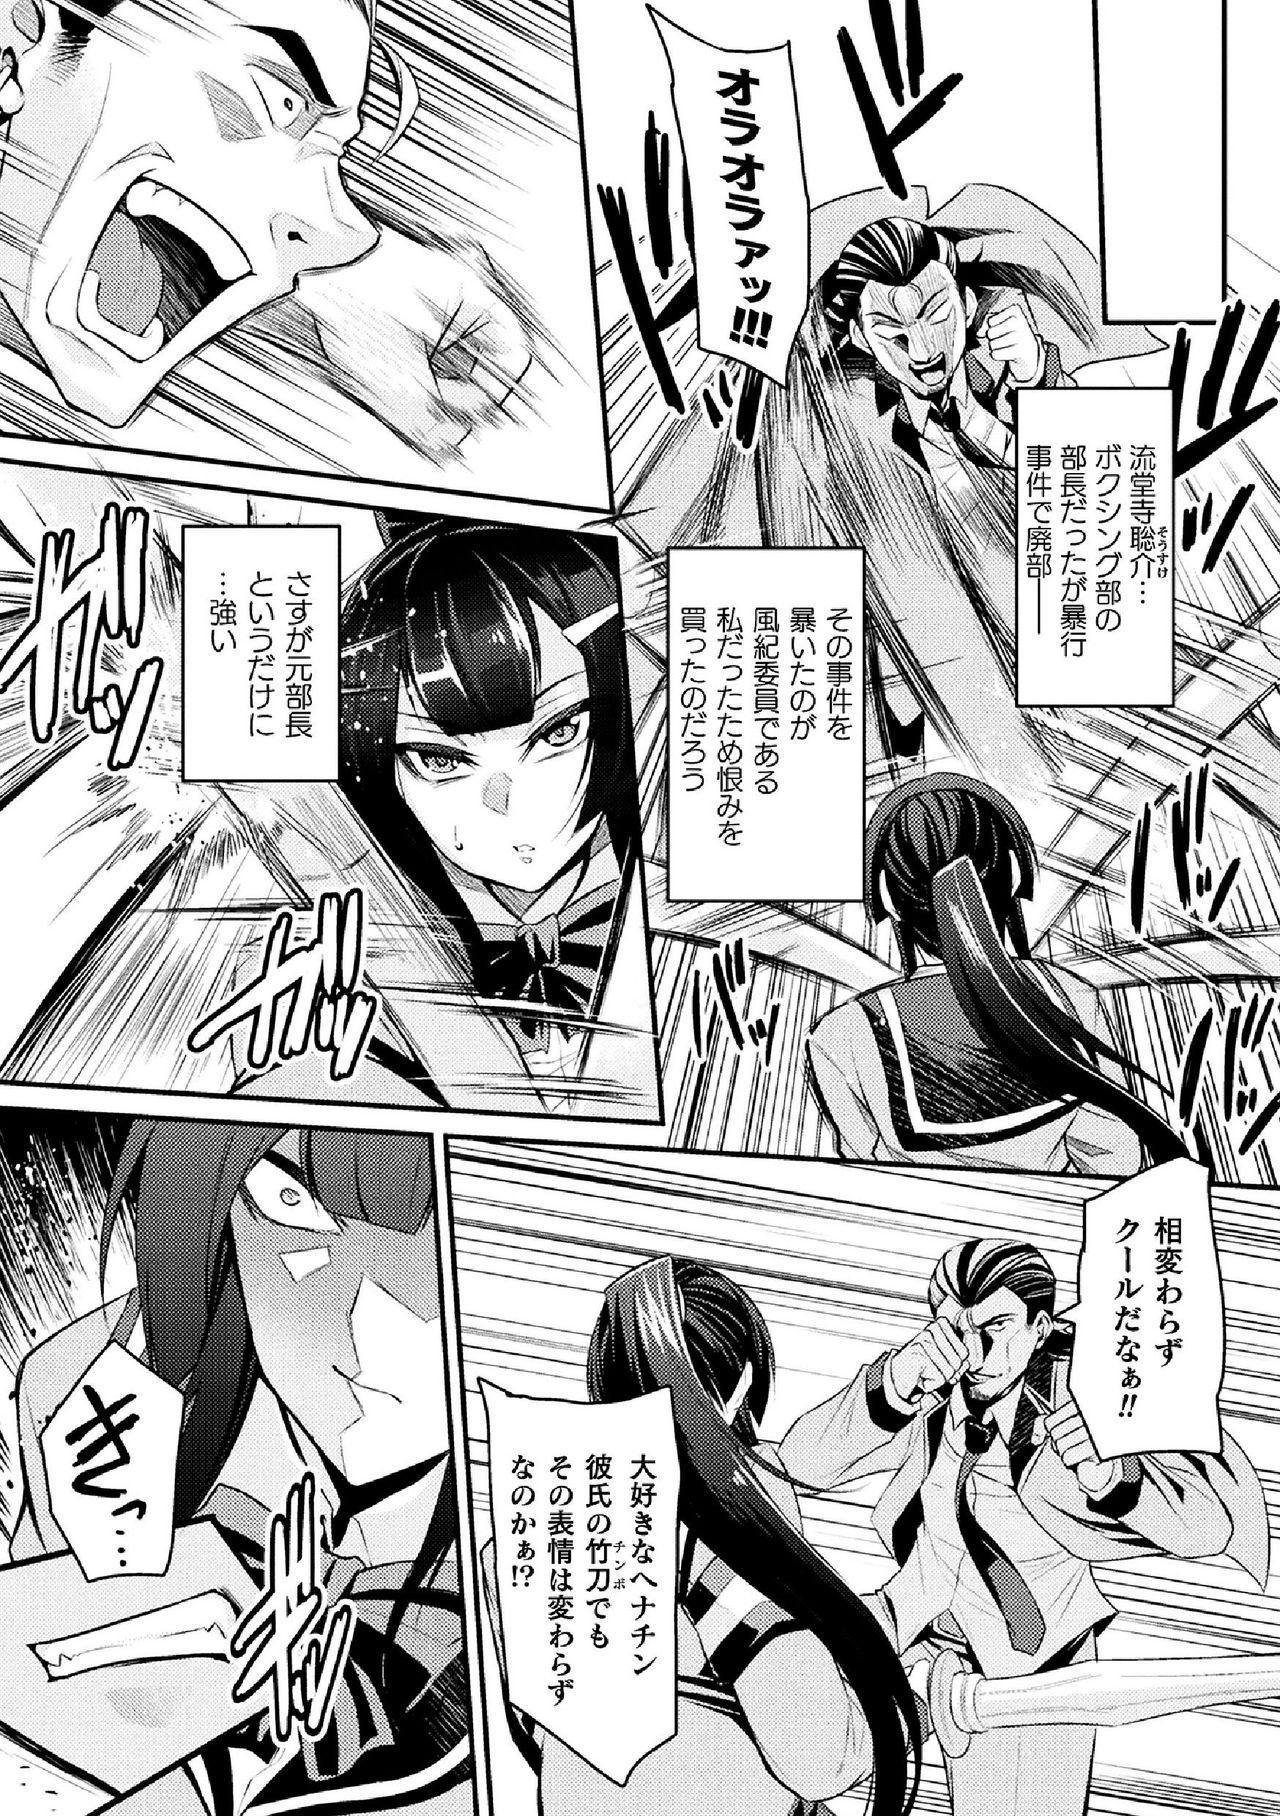 2D Comic Magazine Namaiki Onna ni HaraPun Seisai! Vol. 2 4